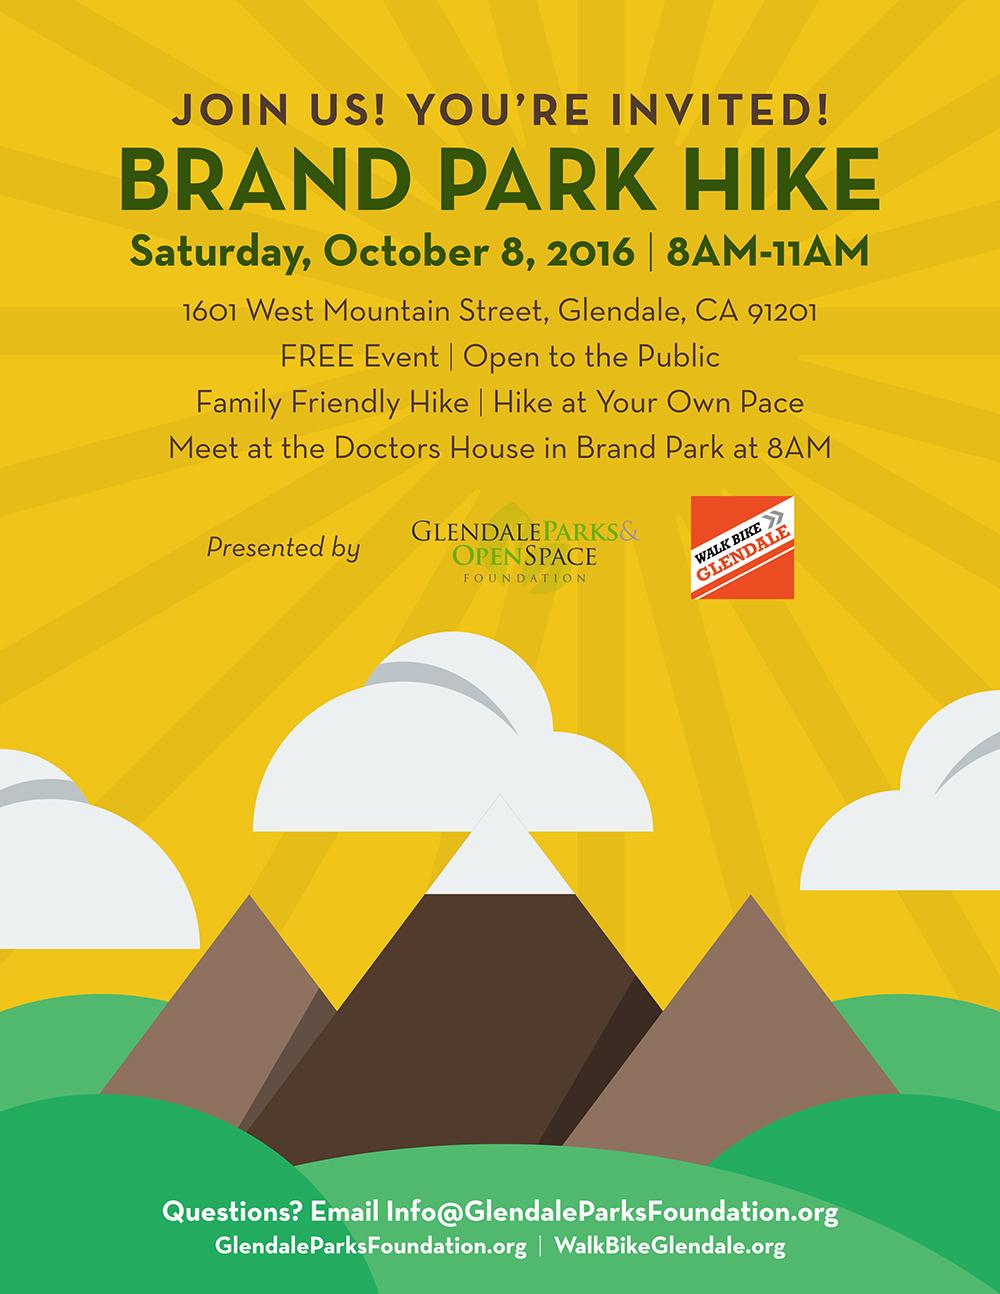 Brand Park Hike Flyer